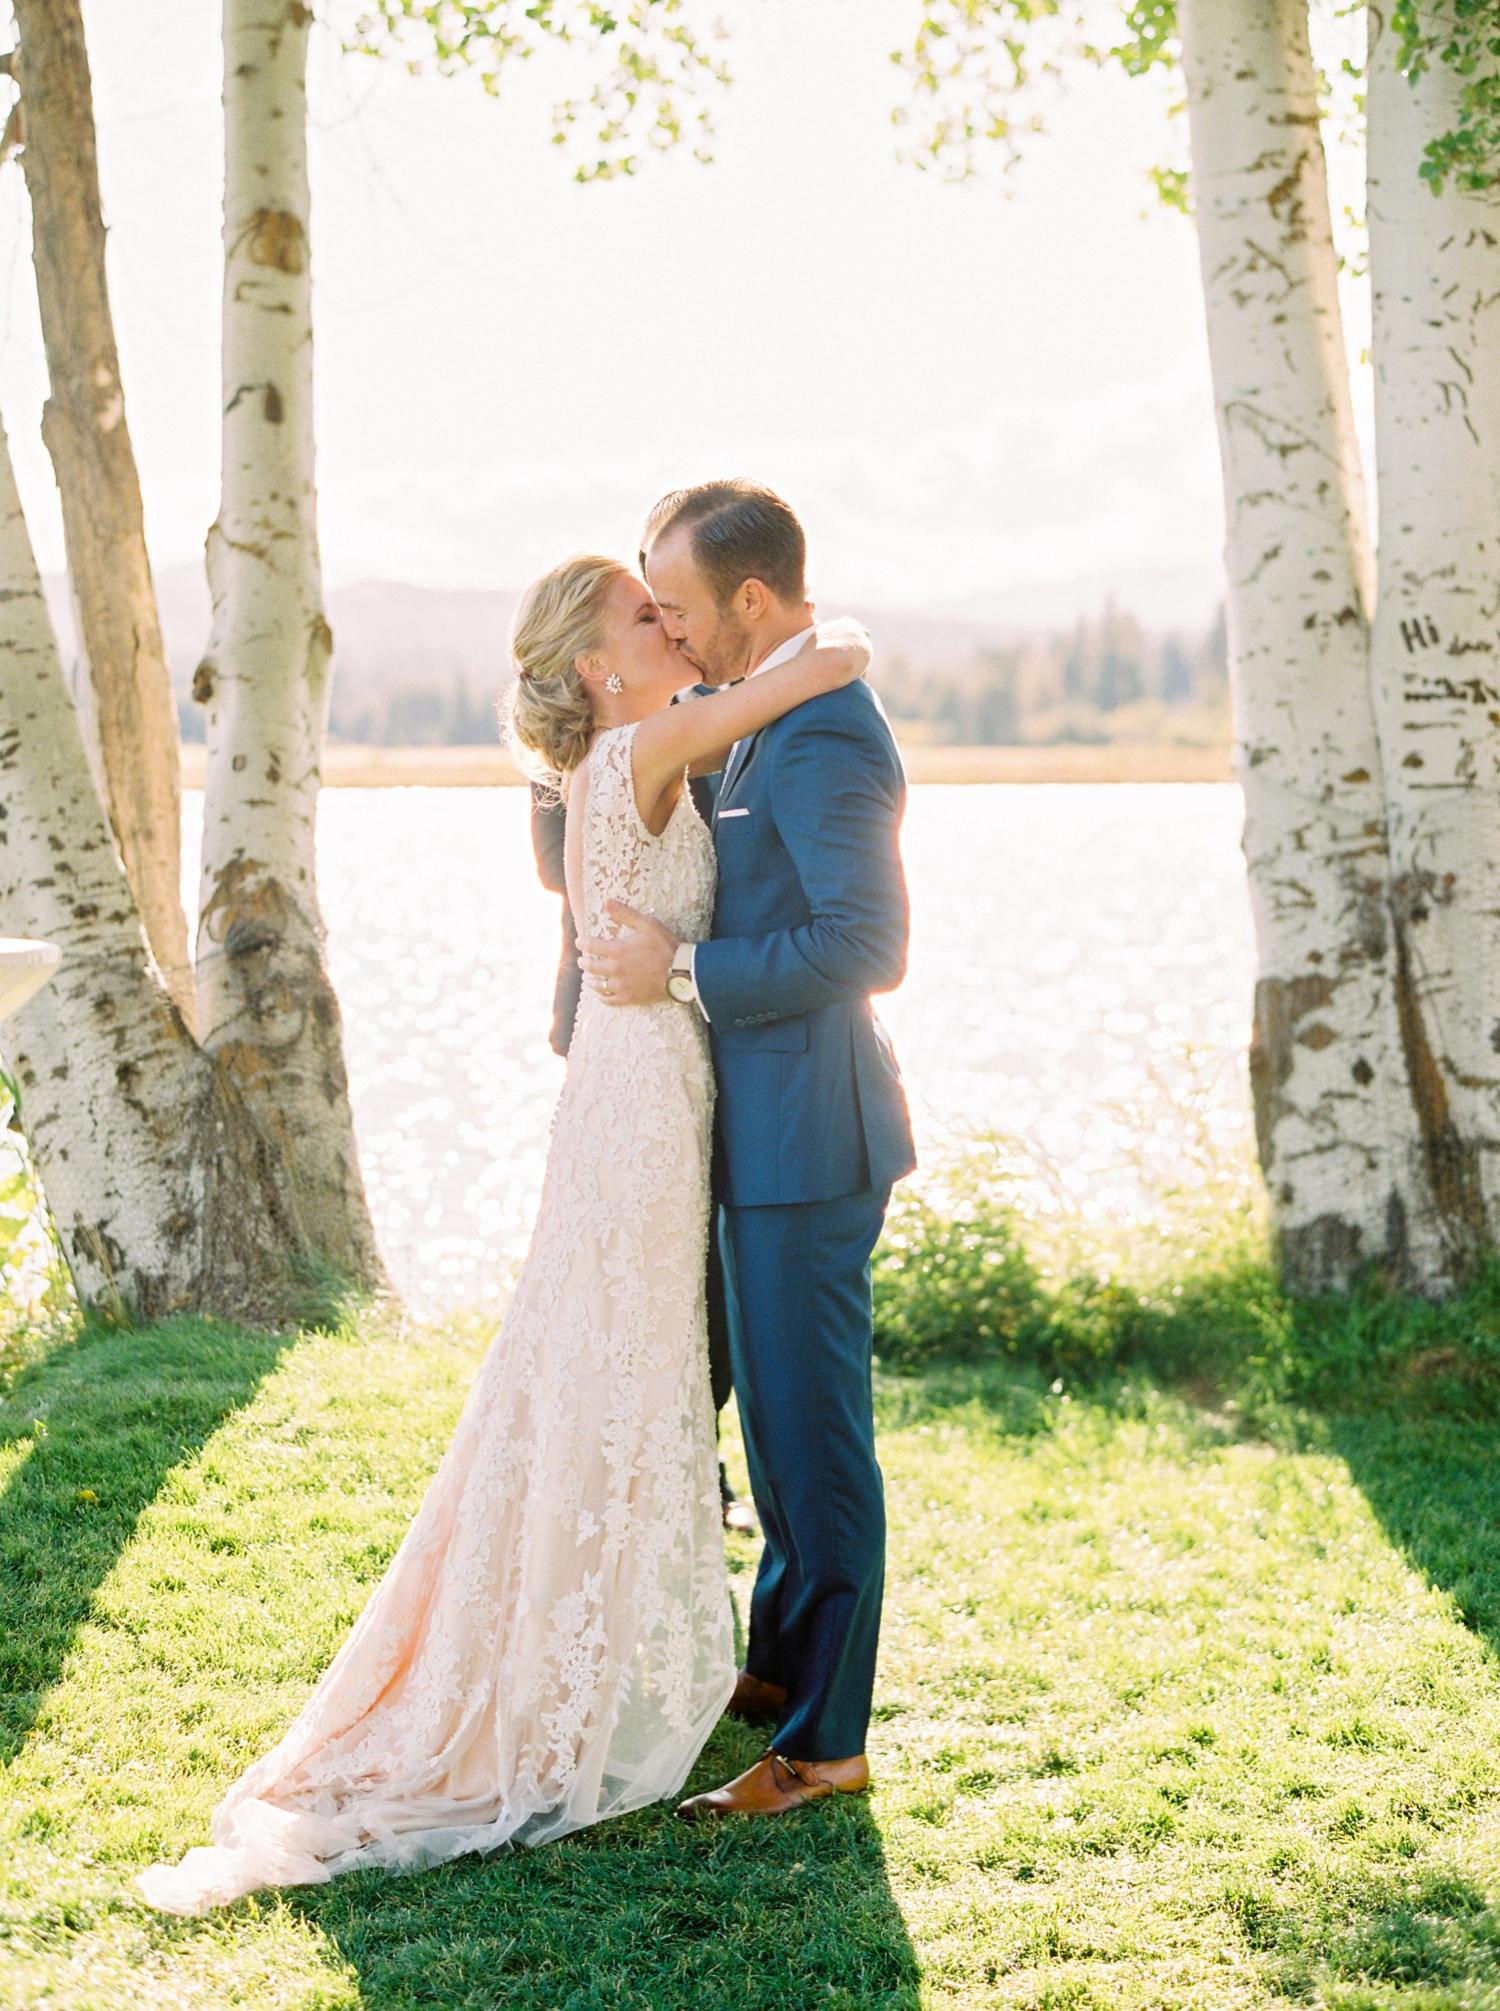 Calgary wedding photographers | oregon wedding photographers | fine art film | Justine Milton Photography | oregon wedding | wedding ceremony | bride and groom | wedding vows | kiss the bride